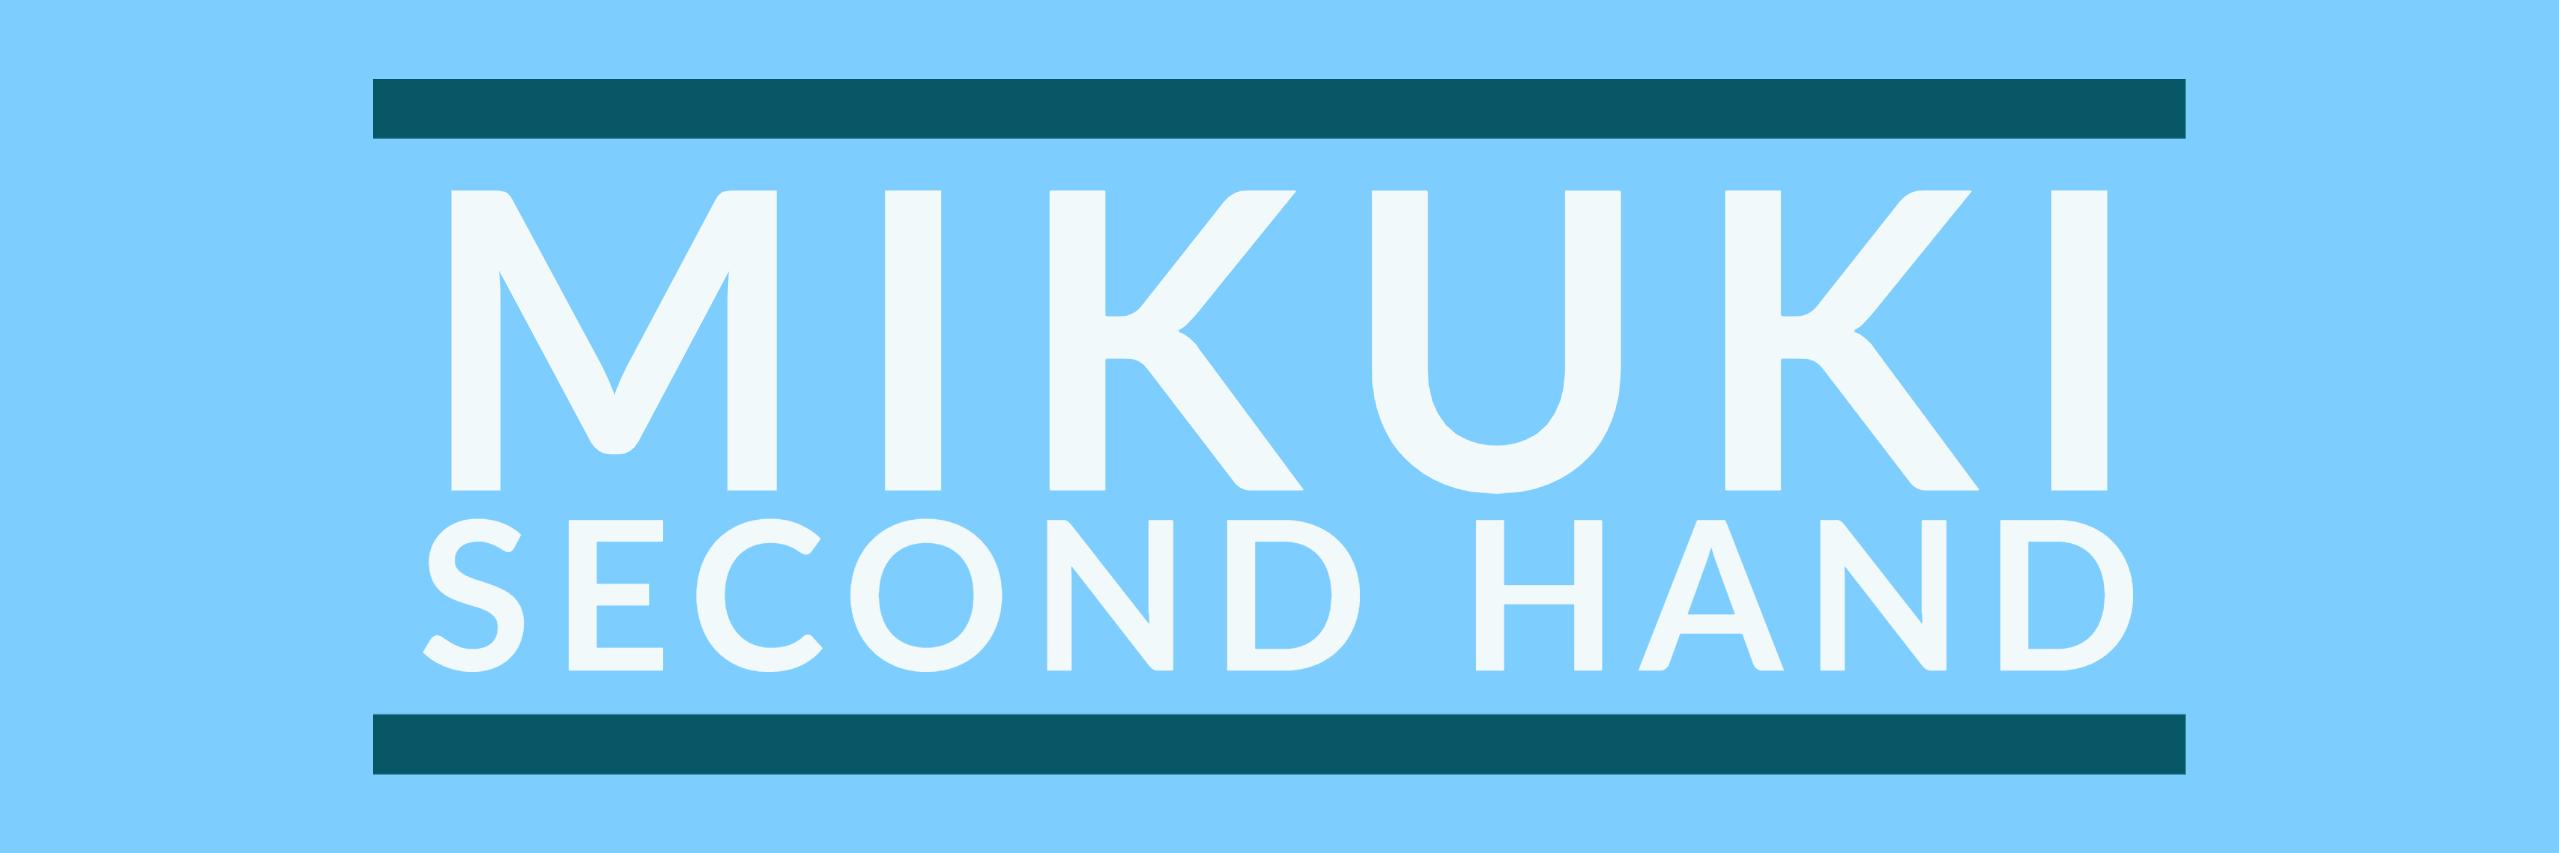 MIKUKI Second Hand